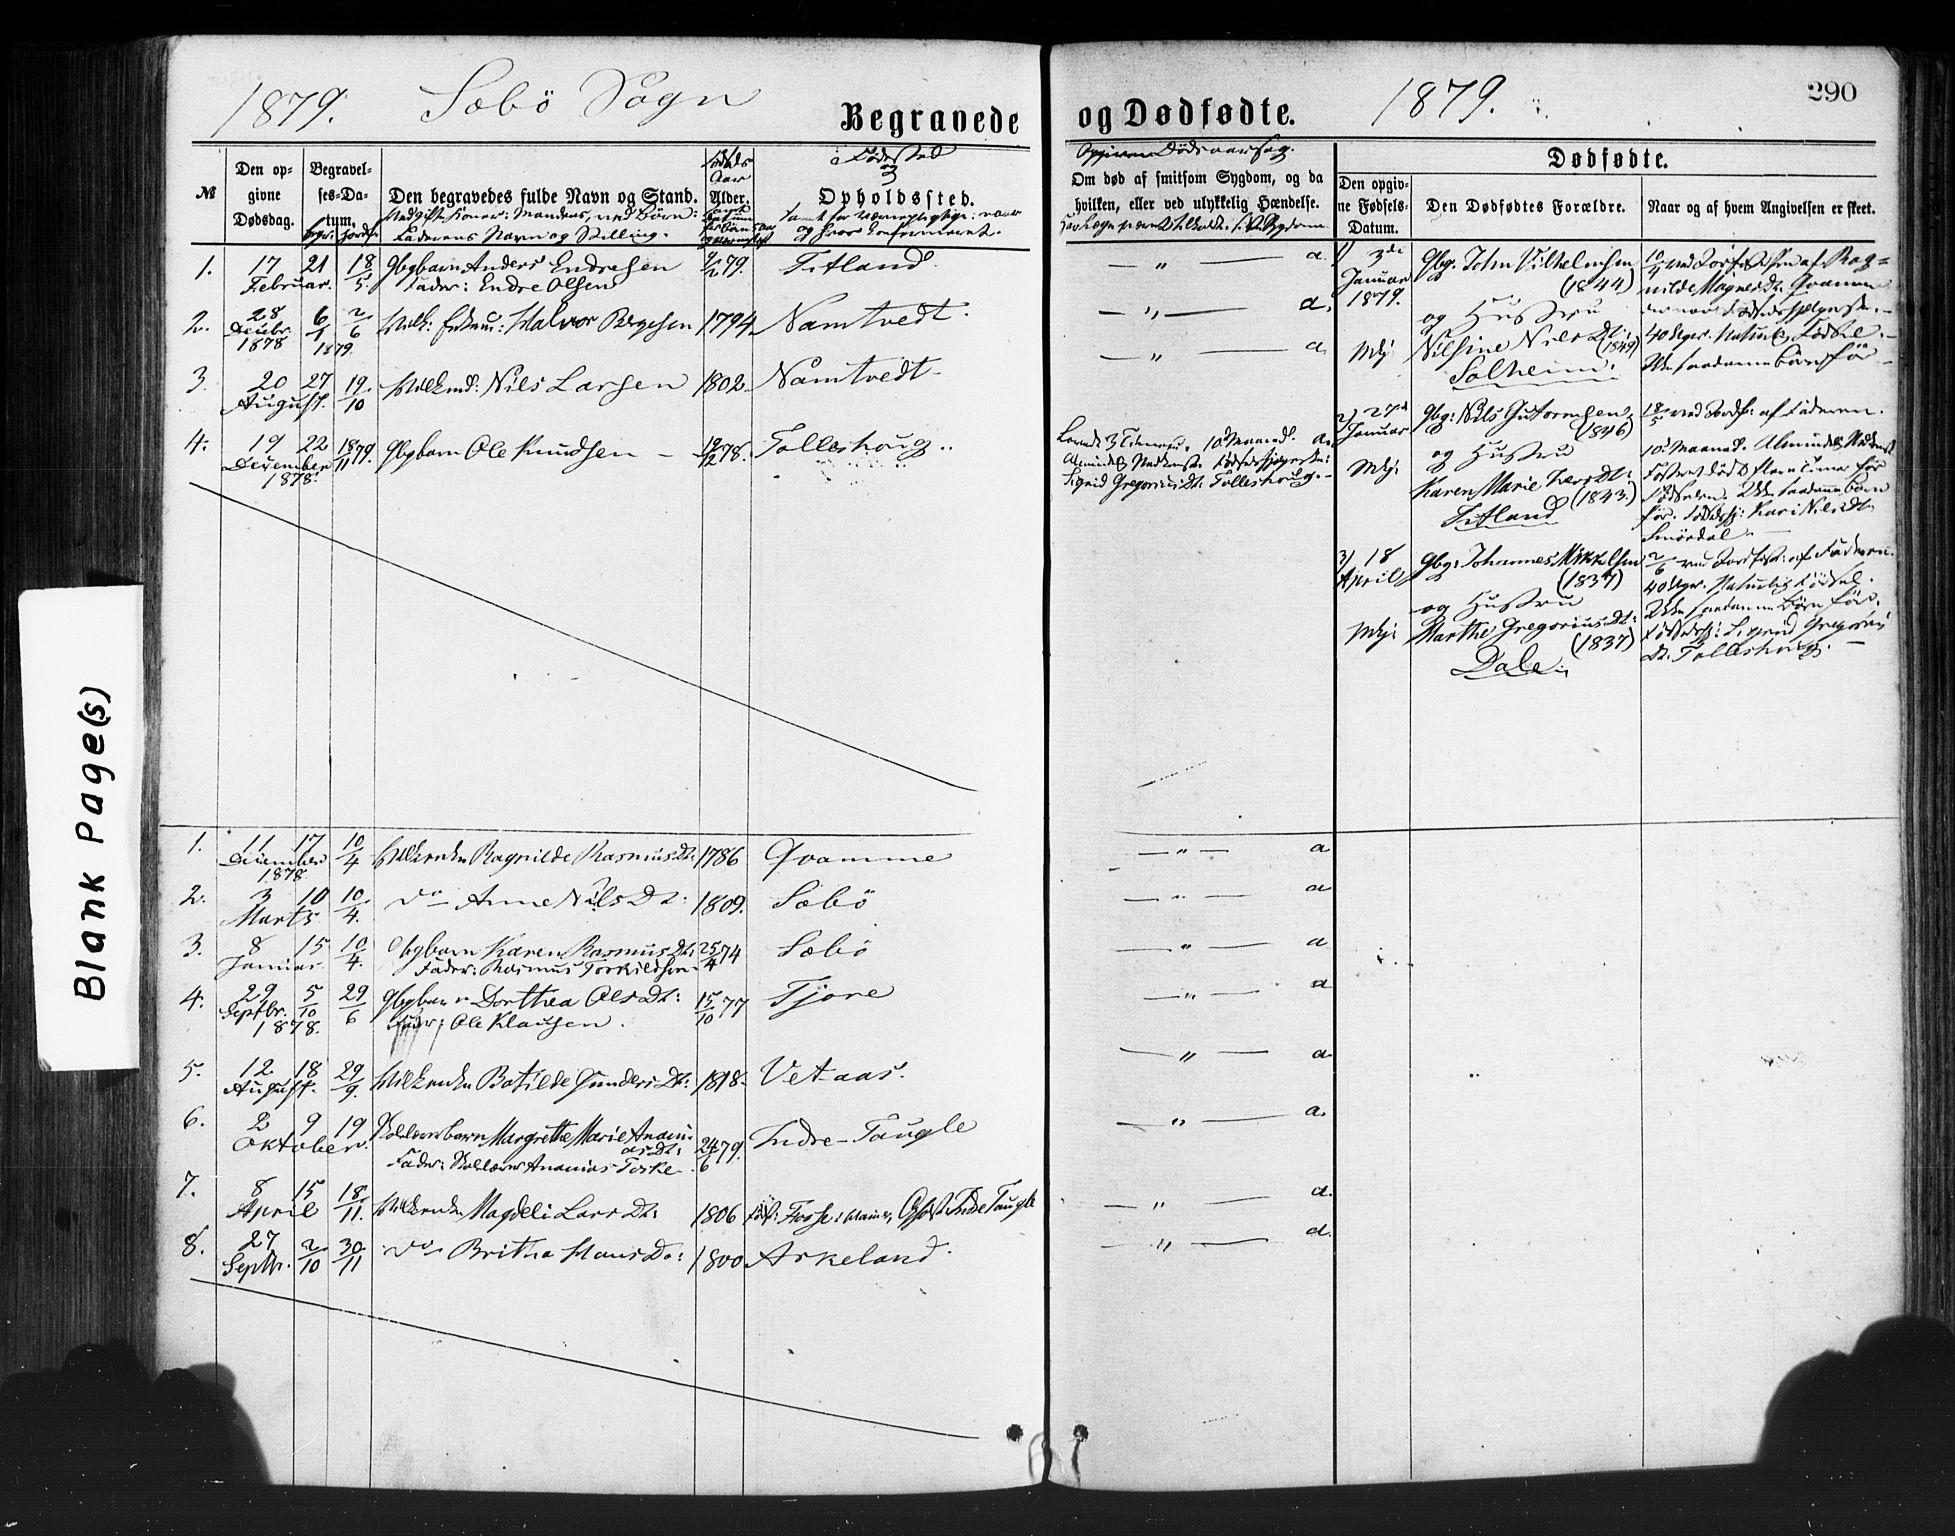 SAB, Manger sokneprestembete, H/Haa: Ministerialbok nr. A 8, 1871-1880, s. 290